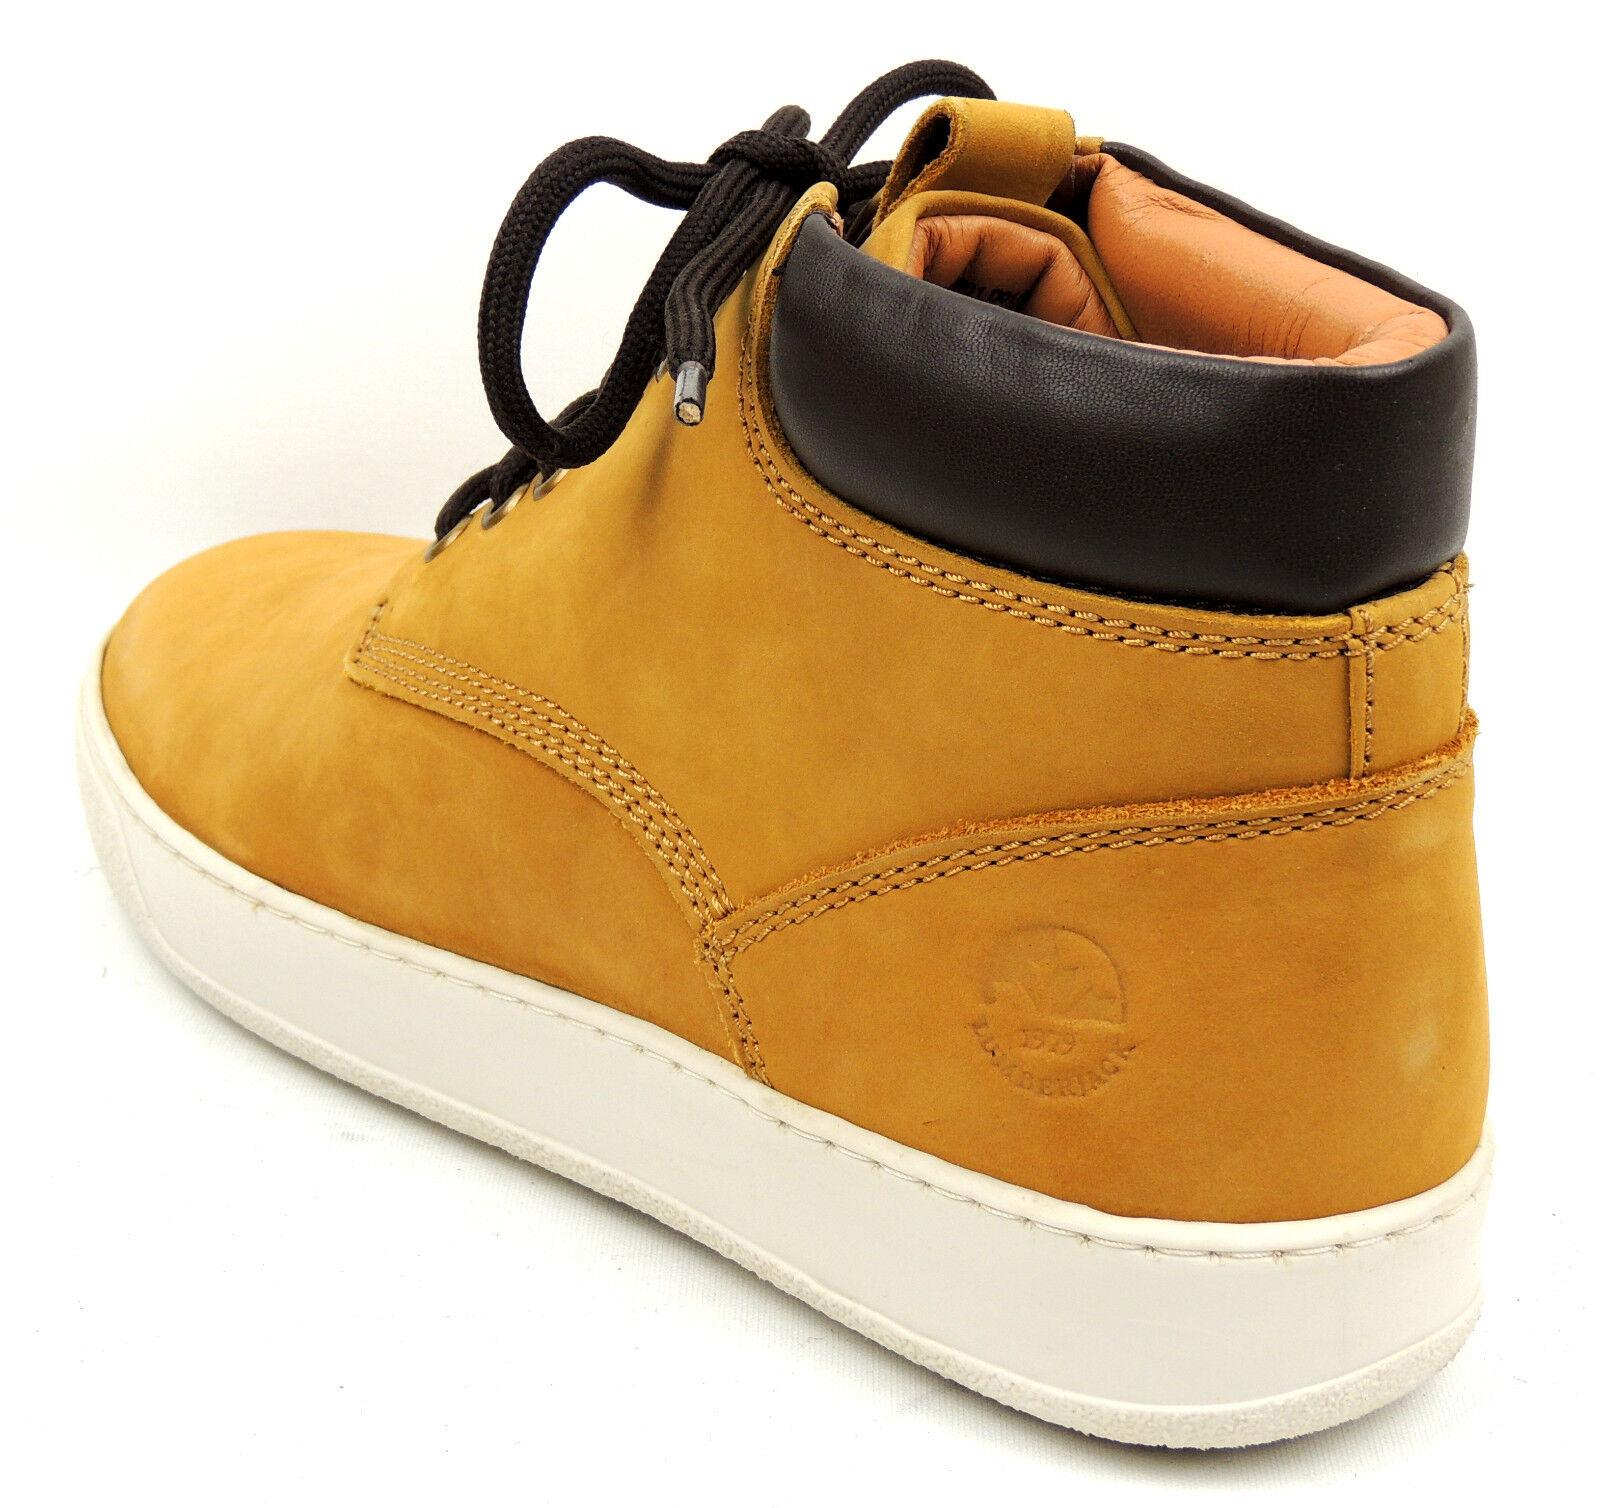 II.WAHL LUMBERJACK  Robuster  Herren Sneaker  LEDER  Robuster yellow  Gr. 43  statt 99,95 af2ed4